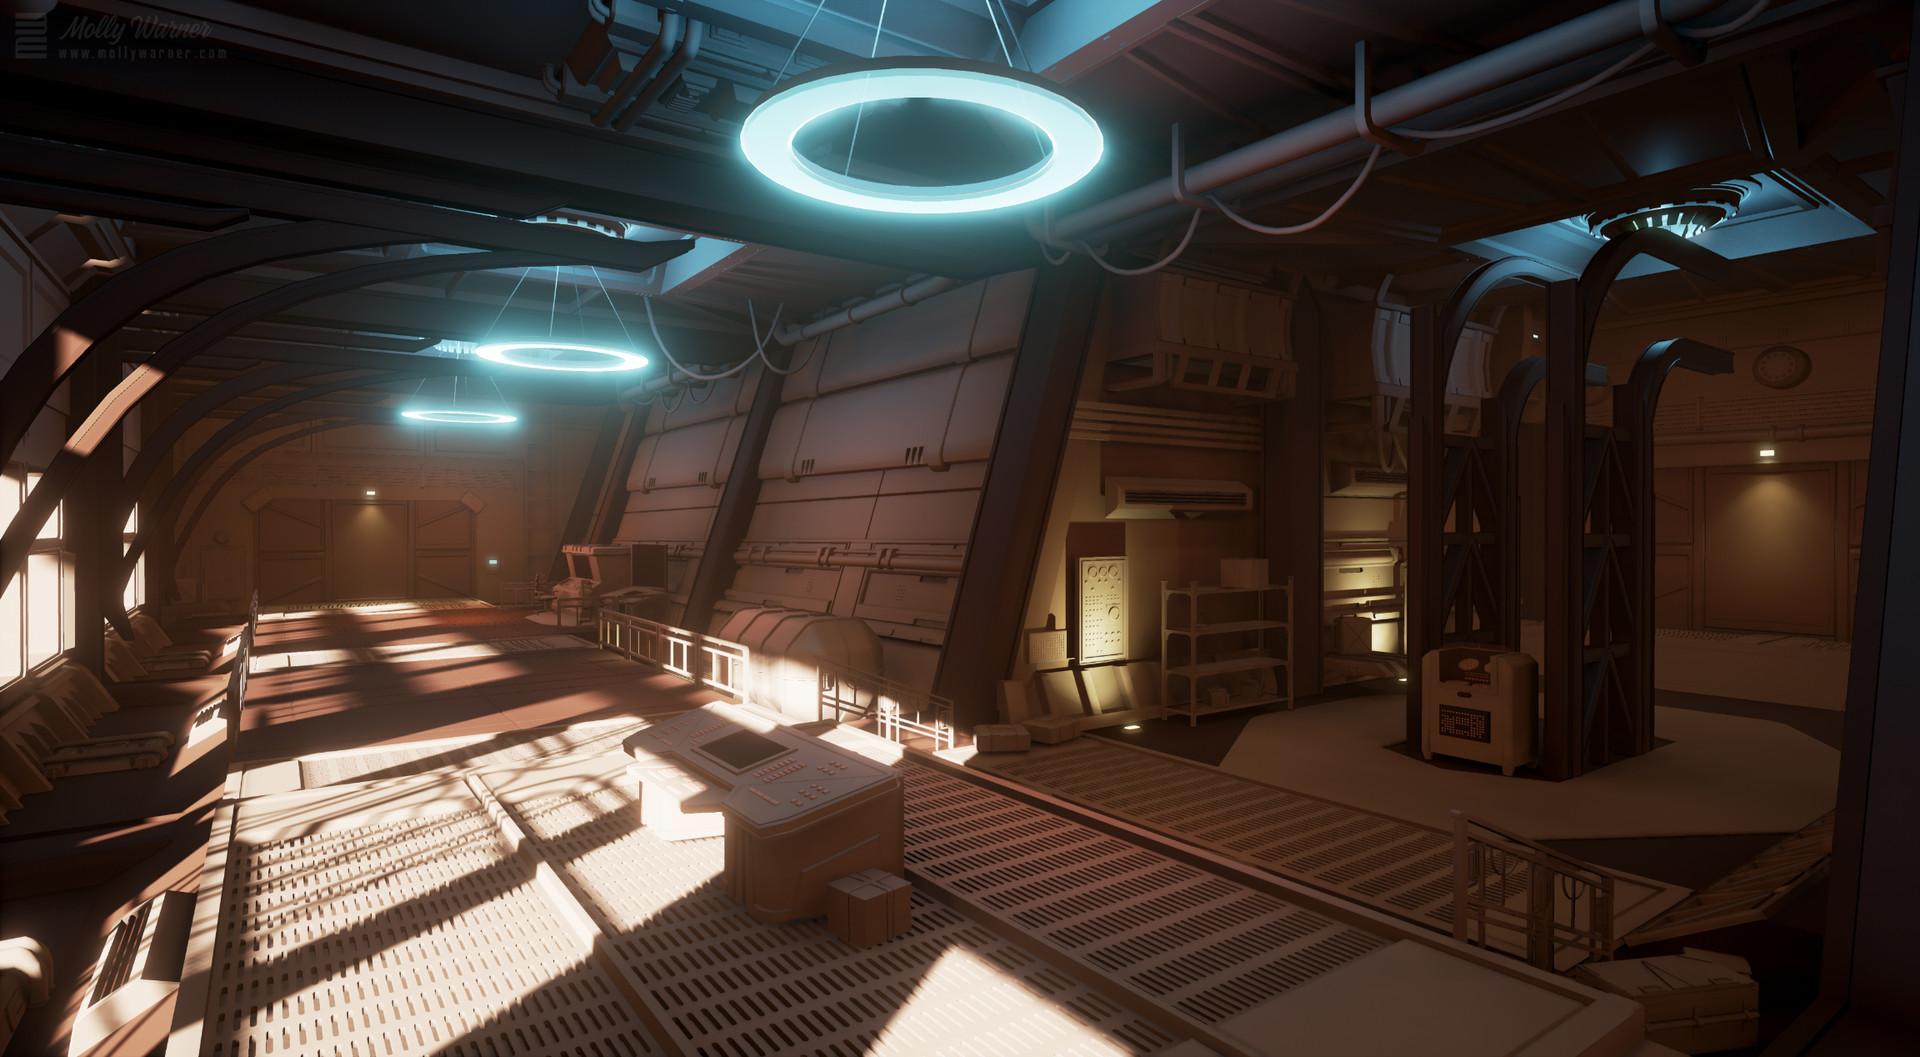 Molly warner art deco sci fi hallway final2